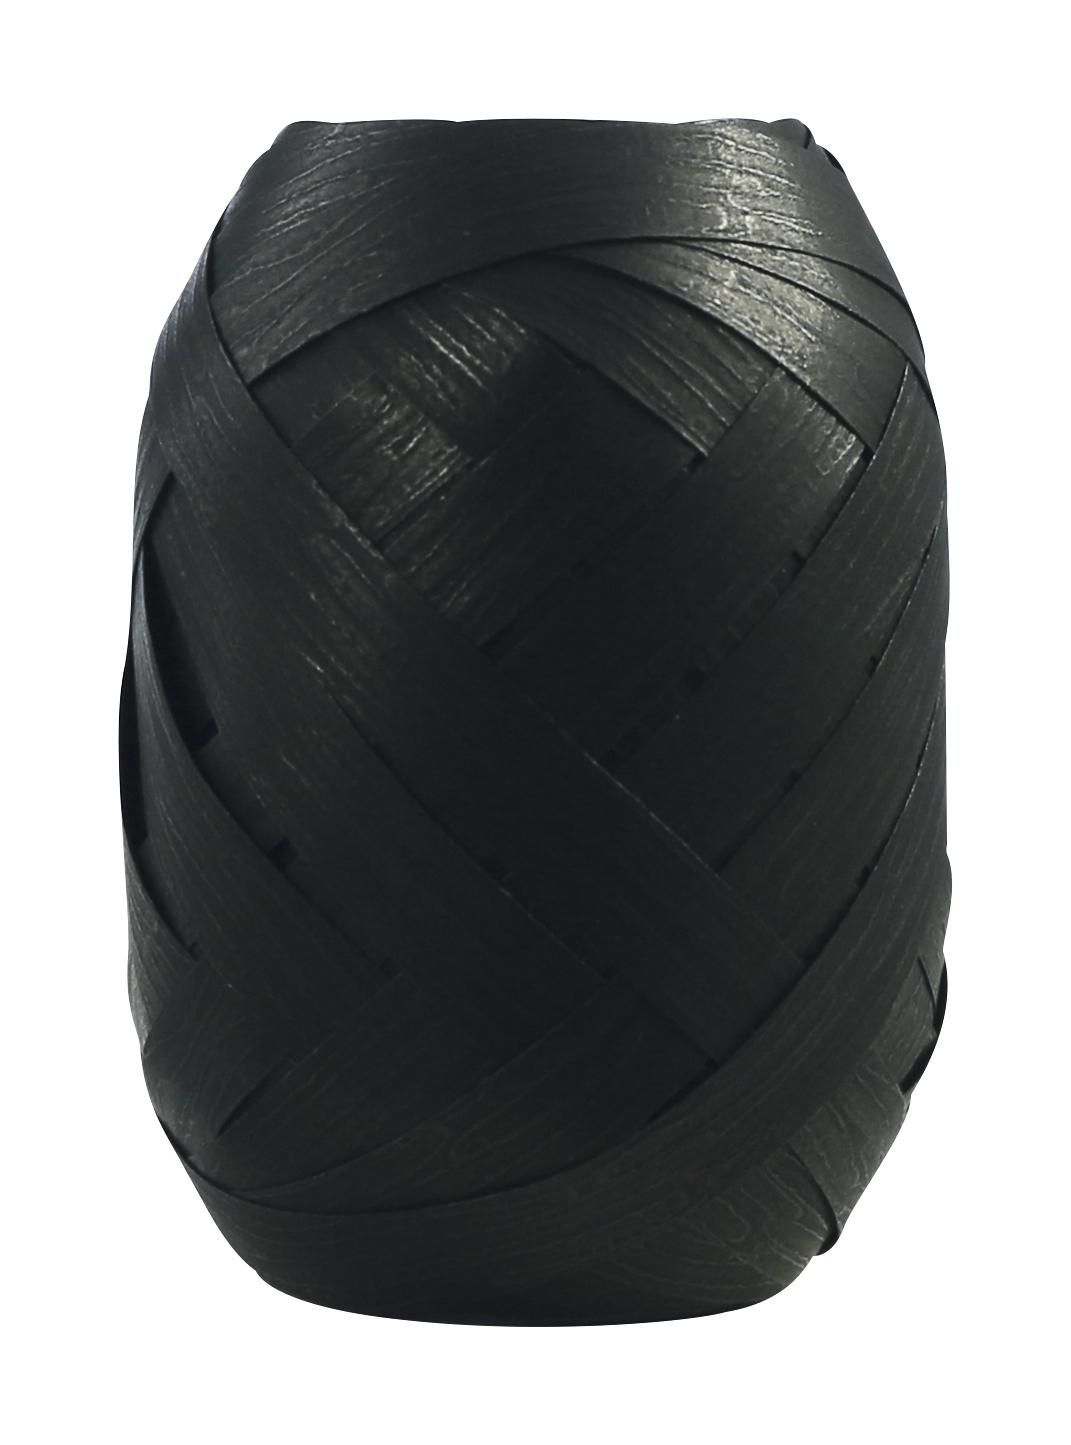 Oeuf - Ruban bolduc noir mat